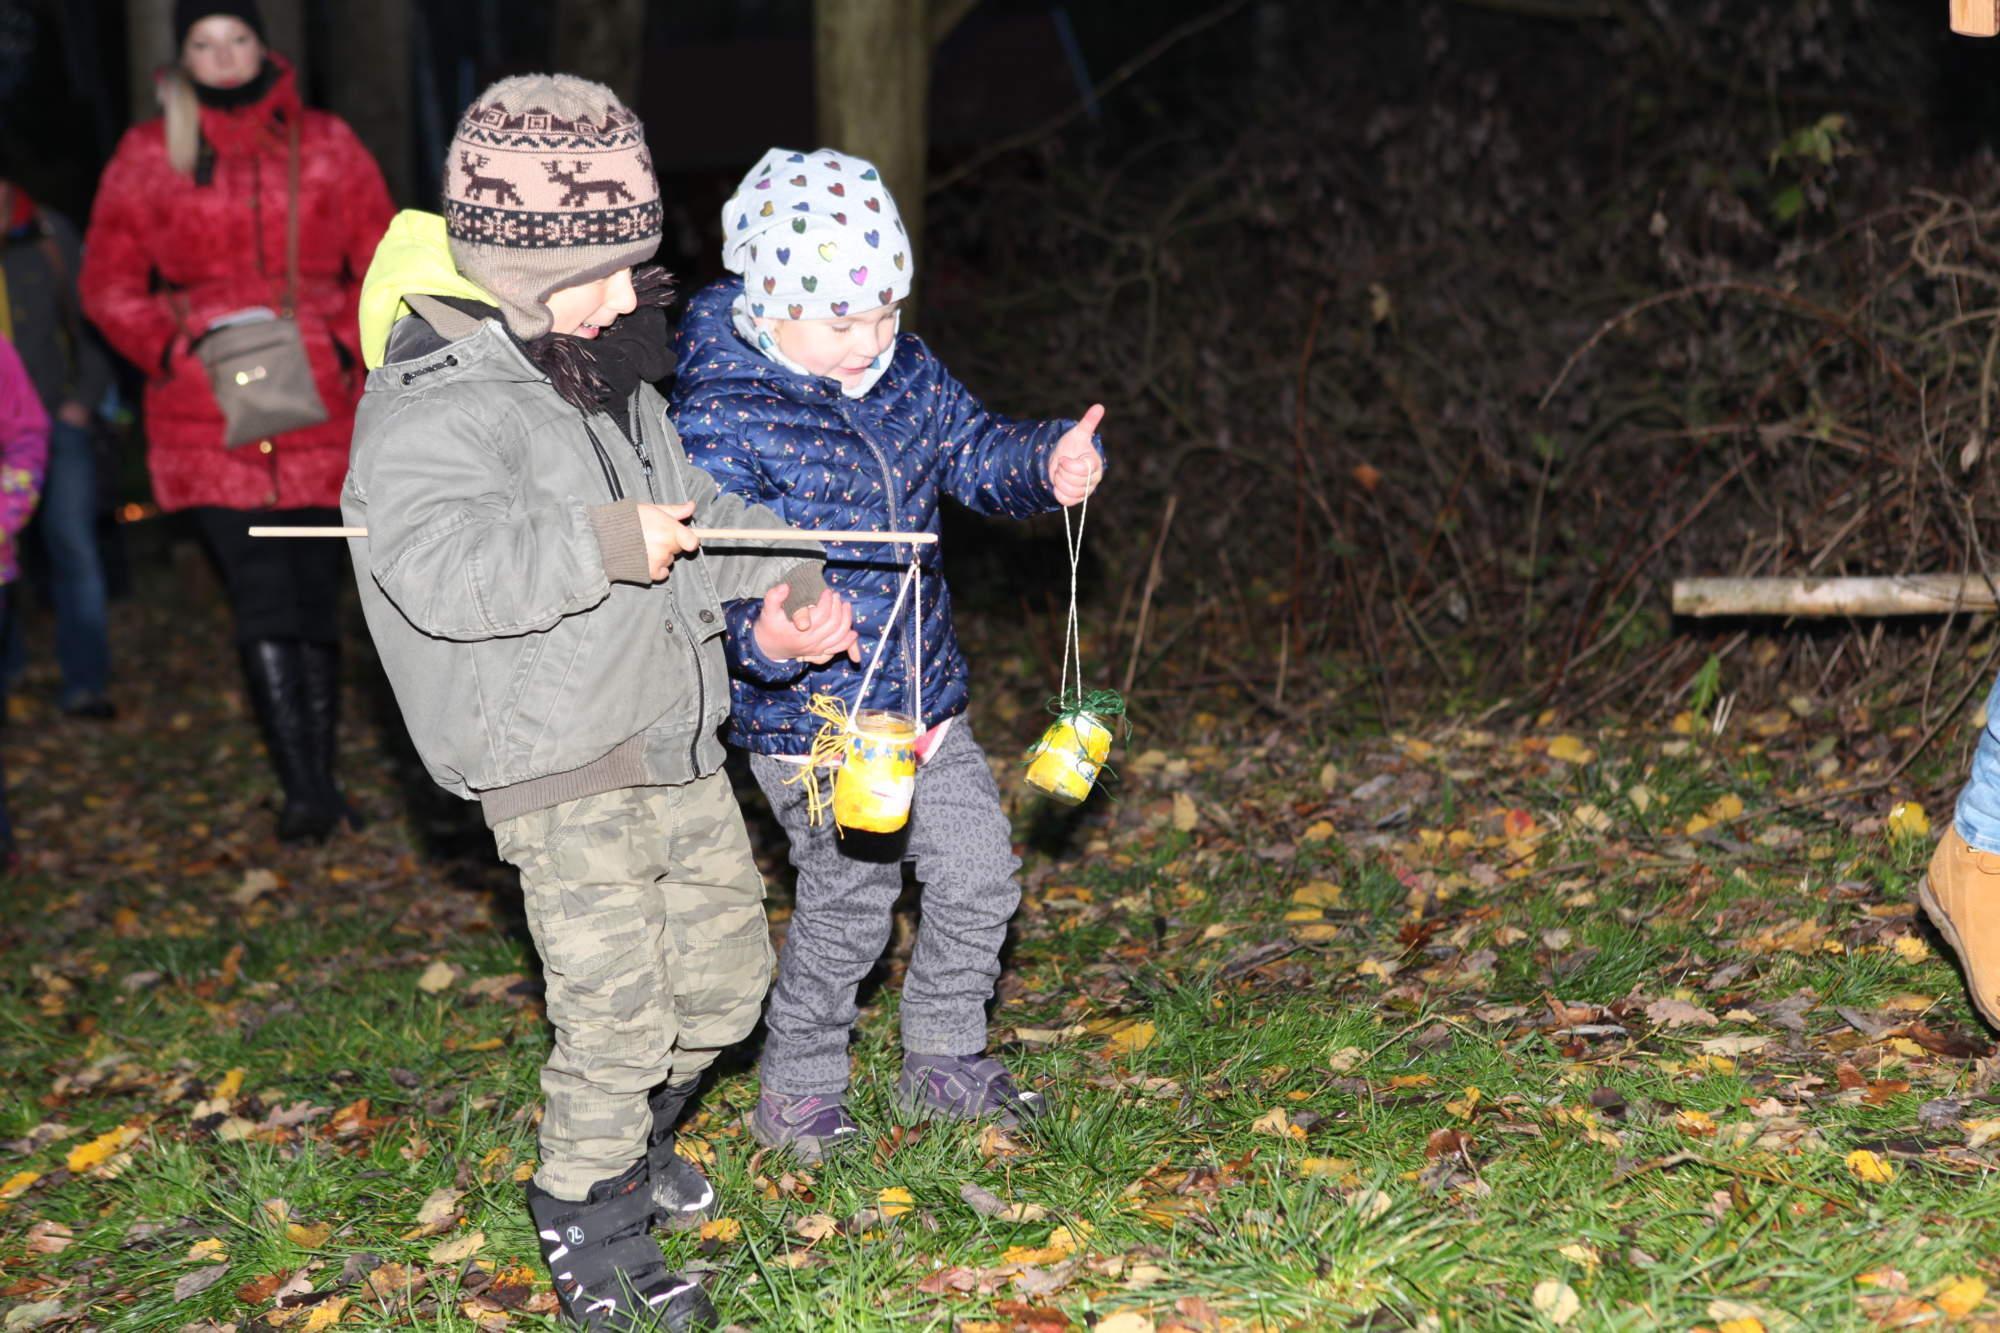 Martin děti lucerny